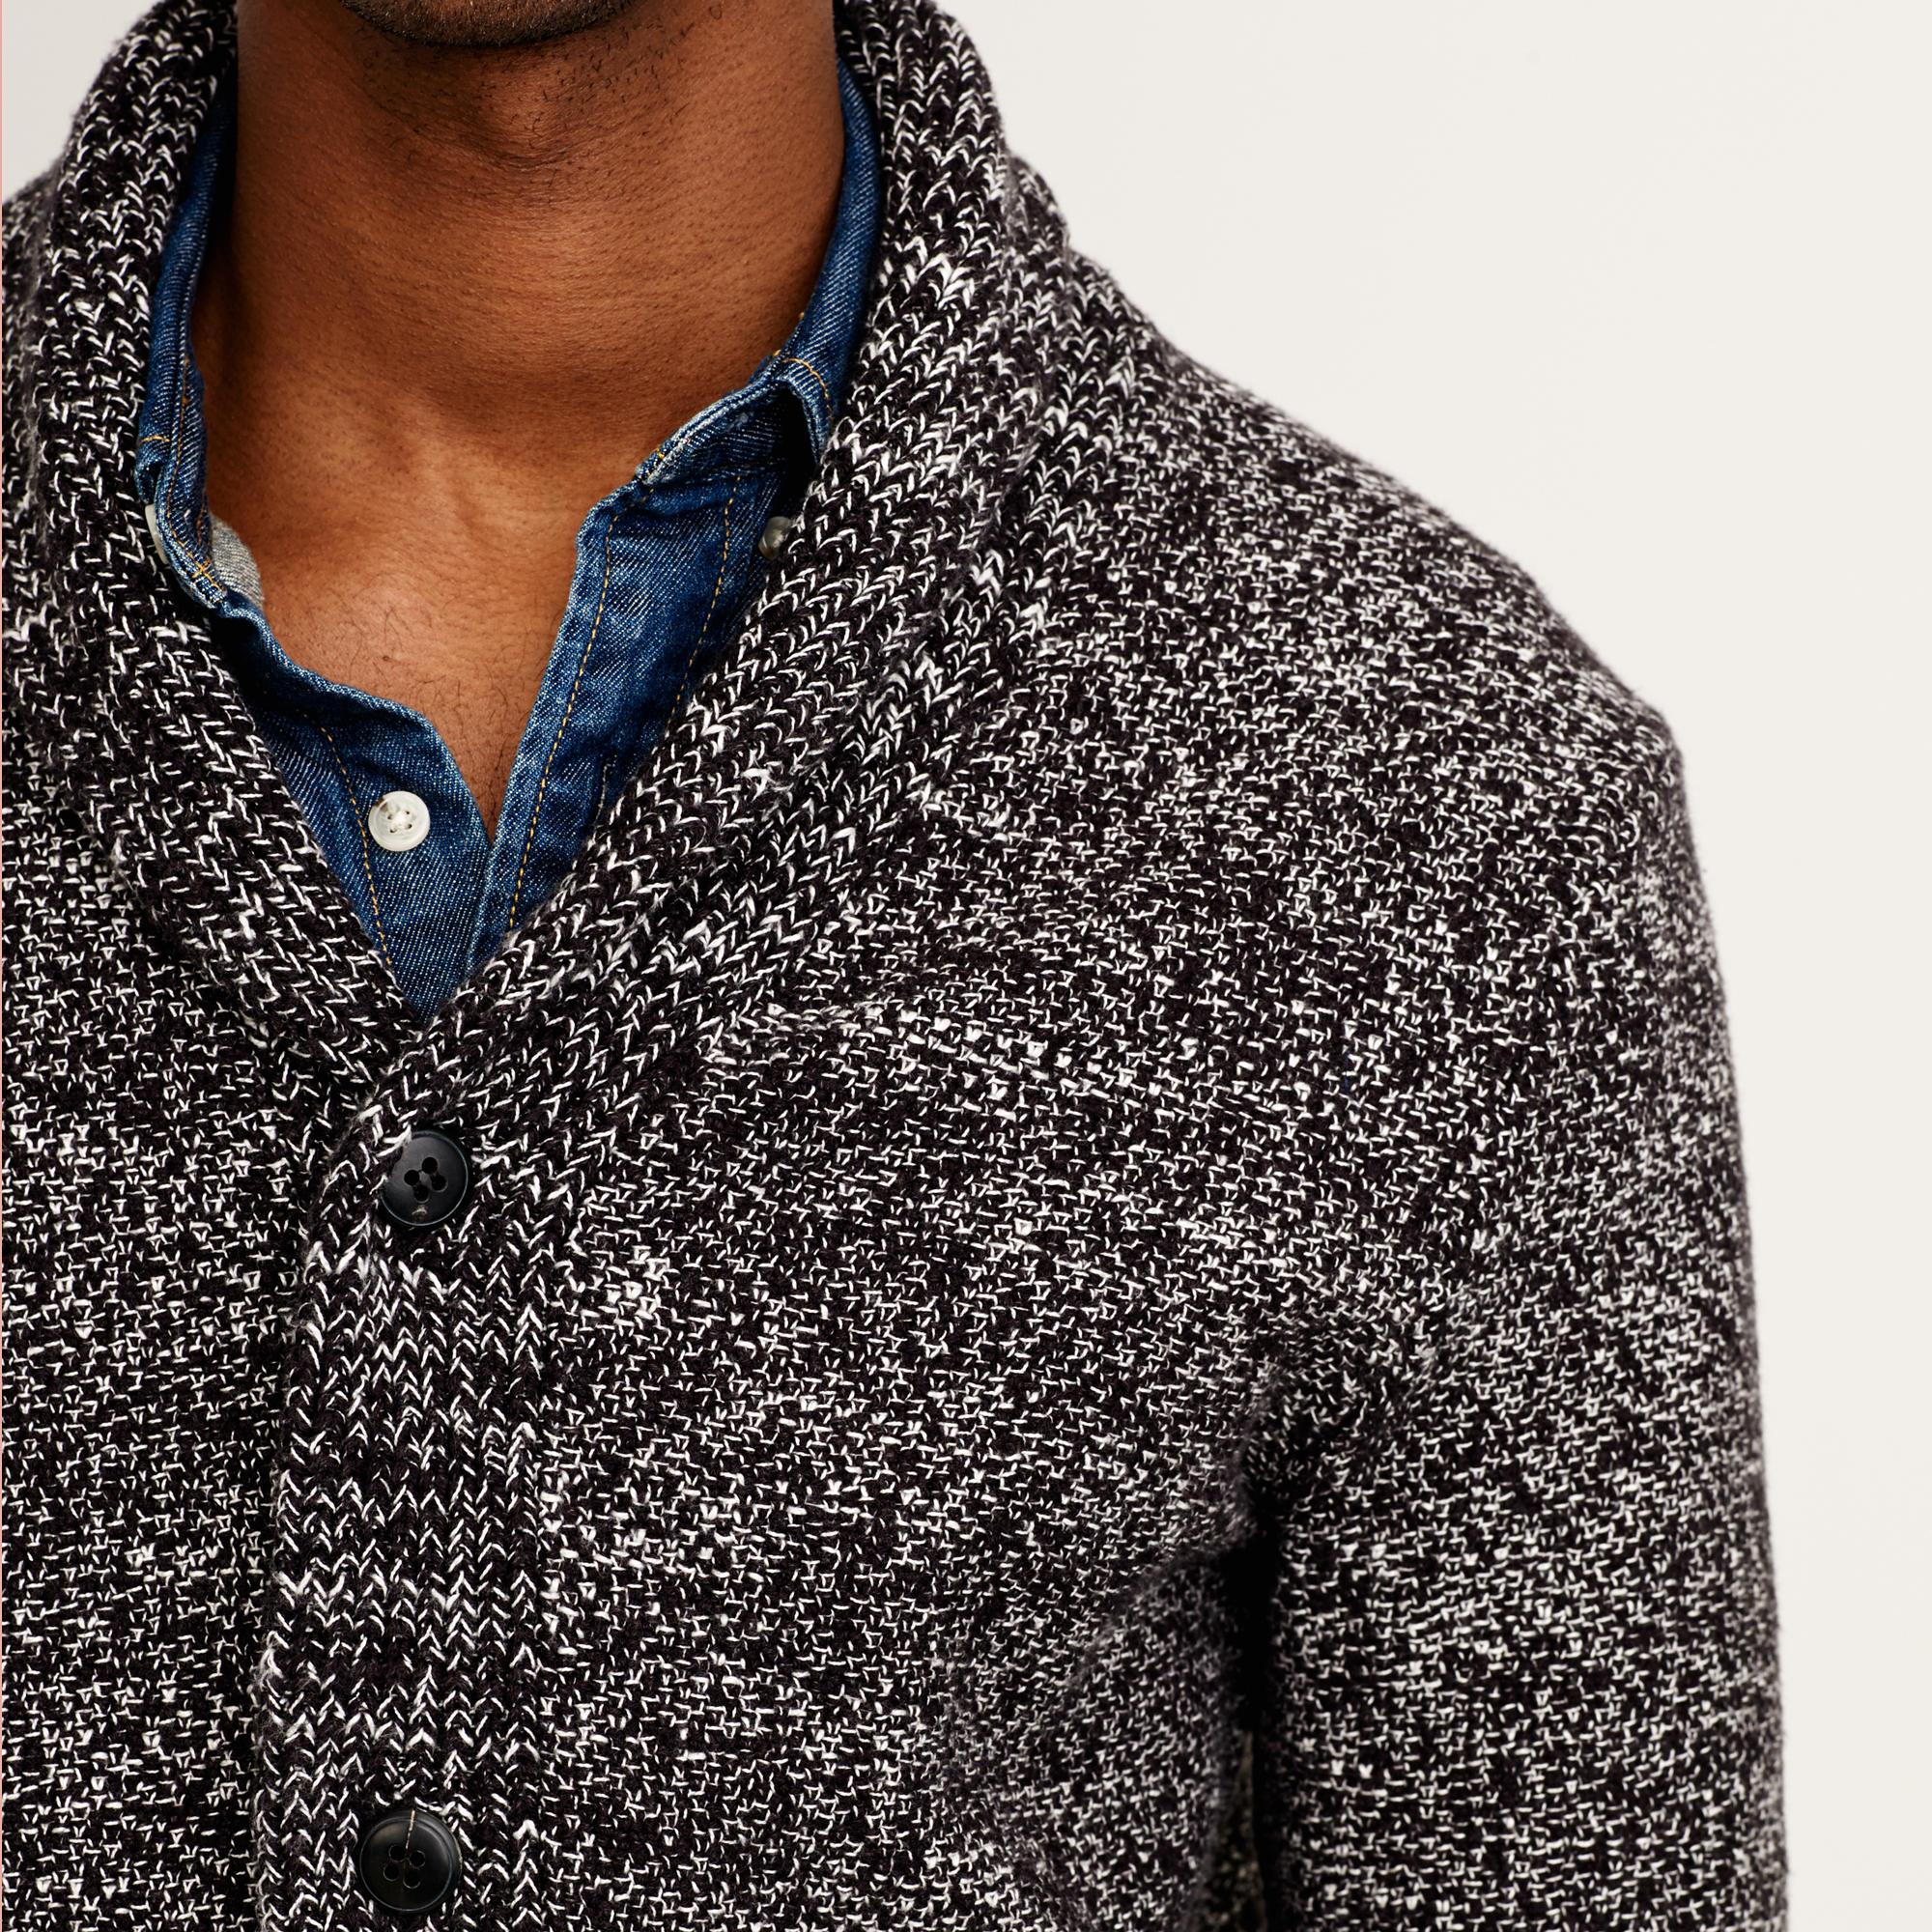 J.crew Marled Cotton Shawl-collar Cardigan Sweater in Black for ...